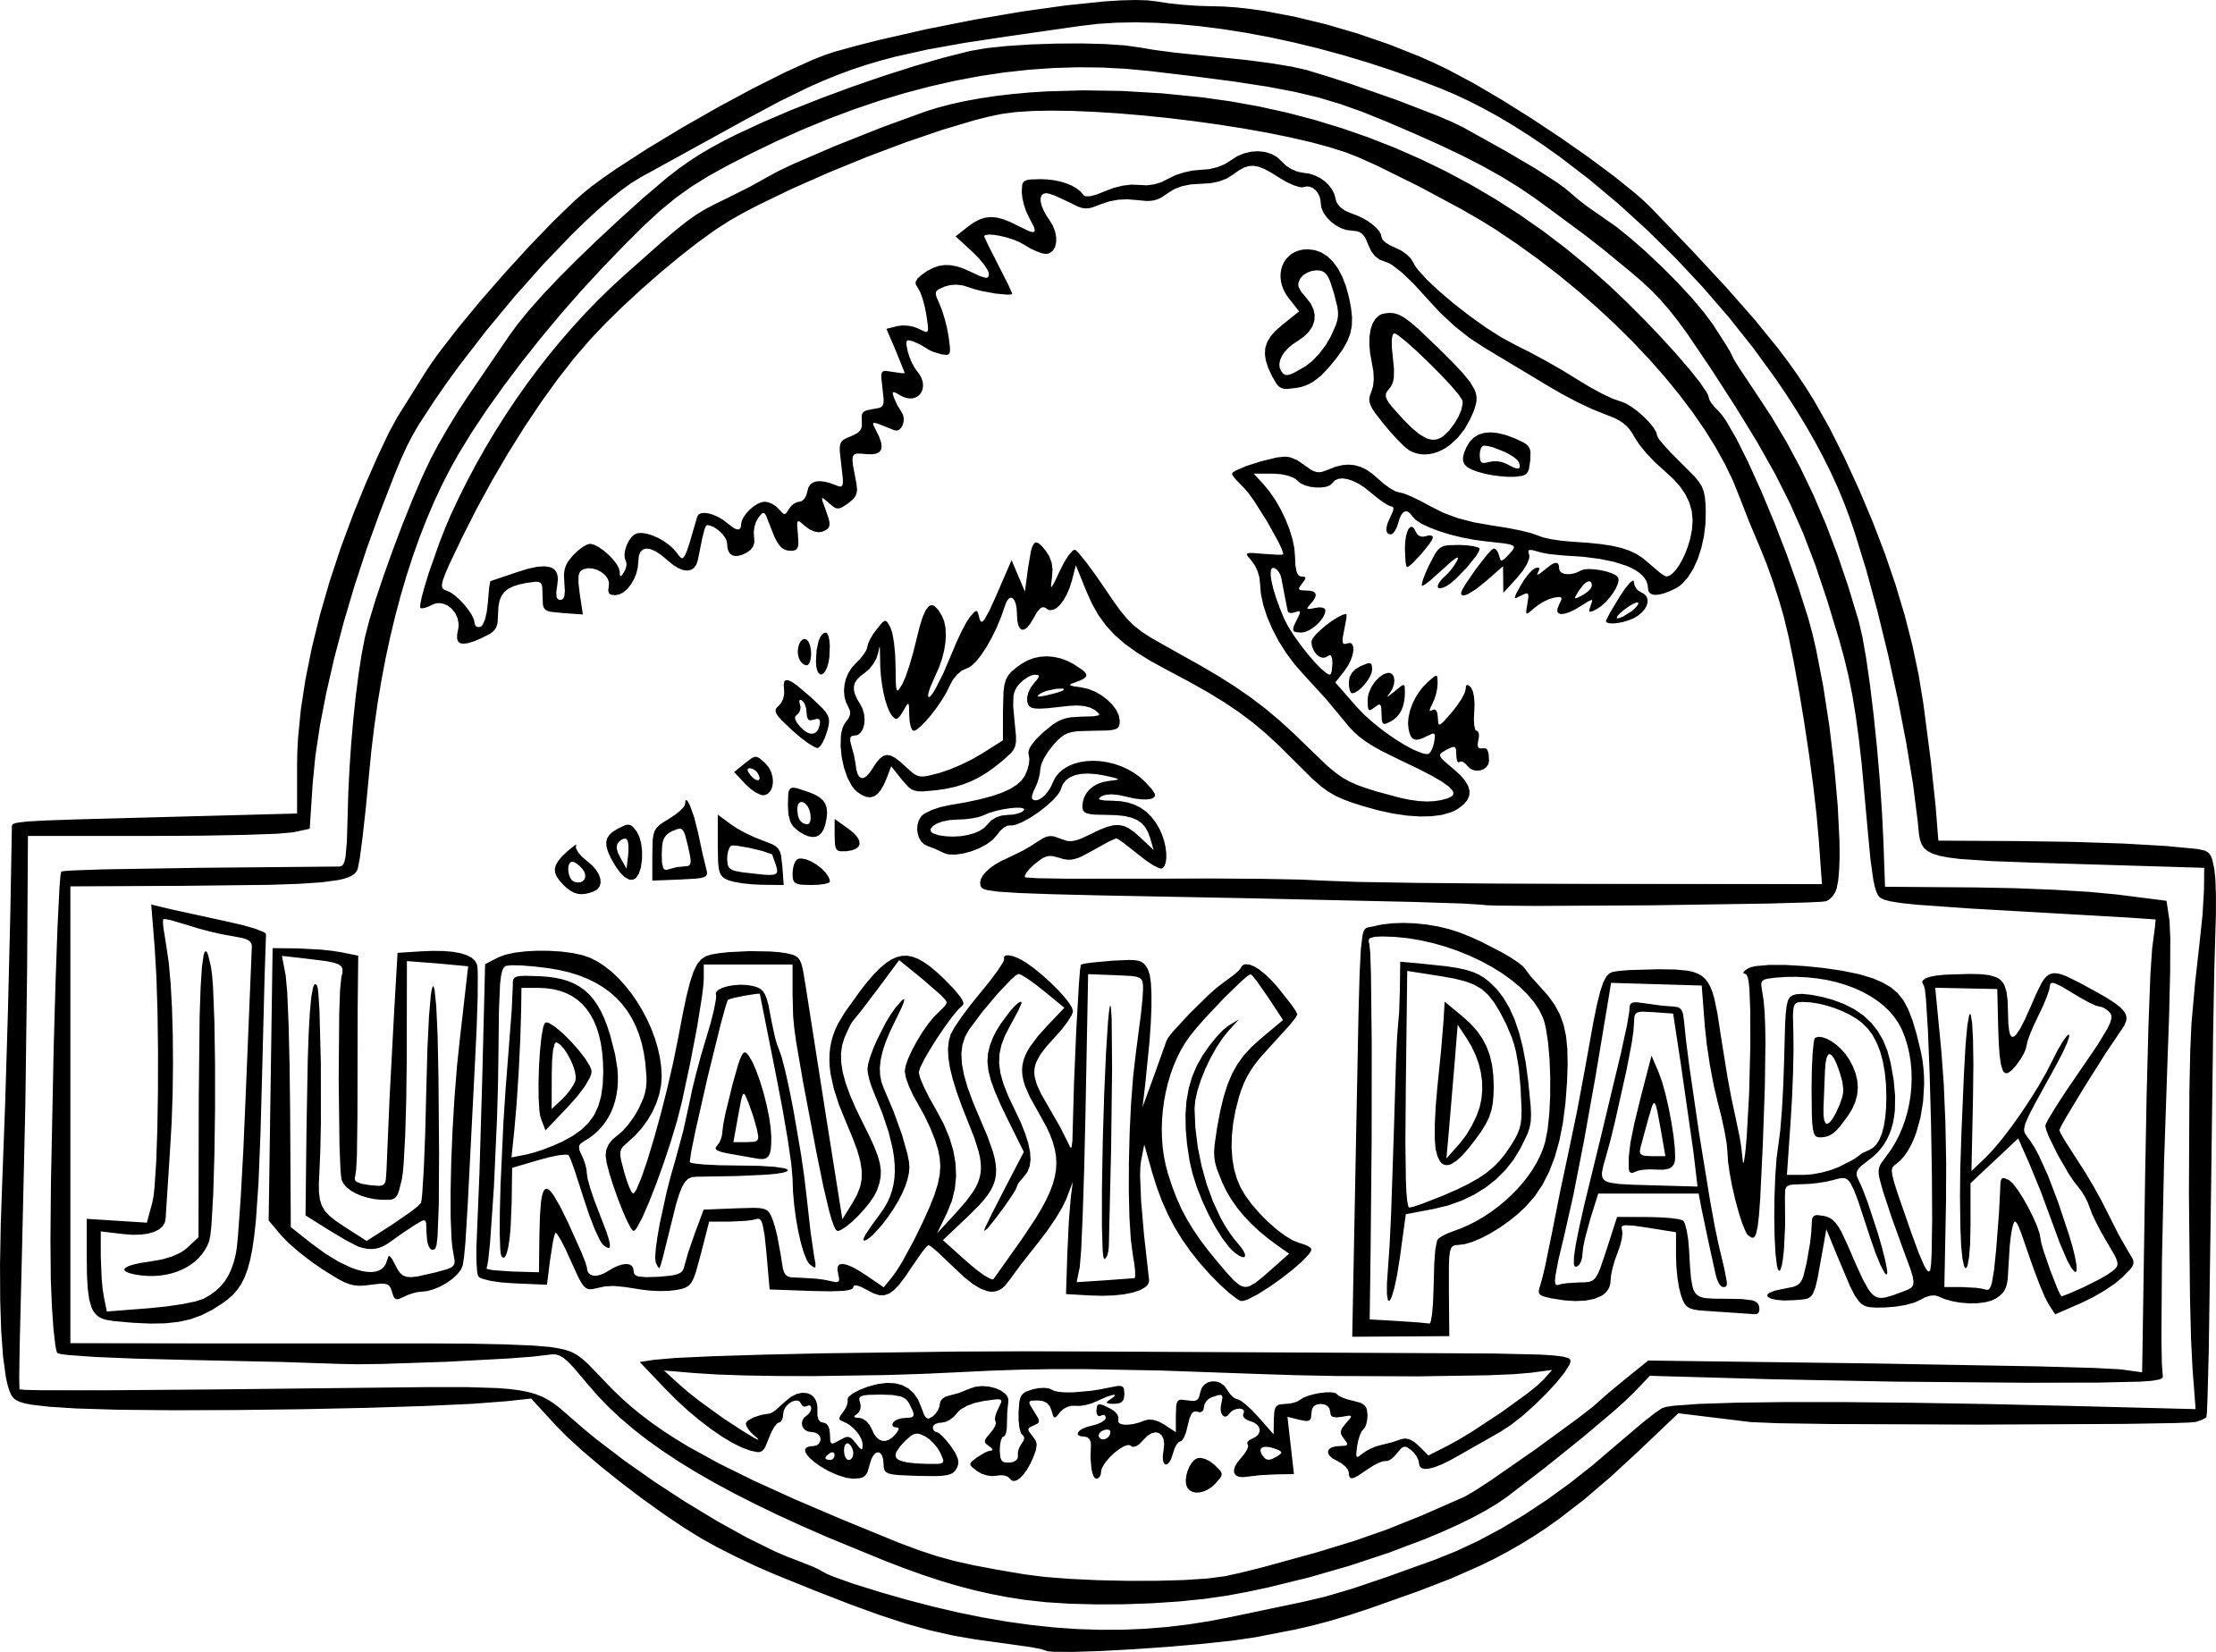 Jurassic Park Coloring Pages Fresh 25 Logo Festa Mundo